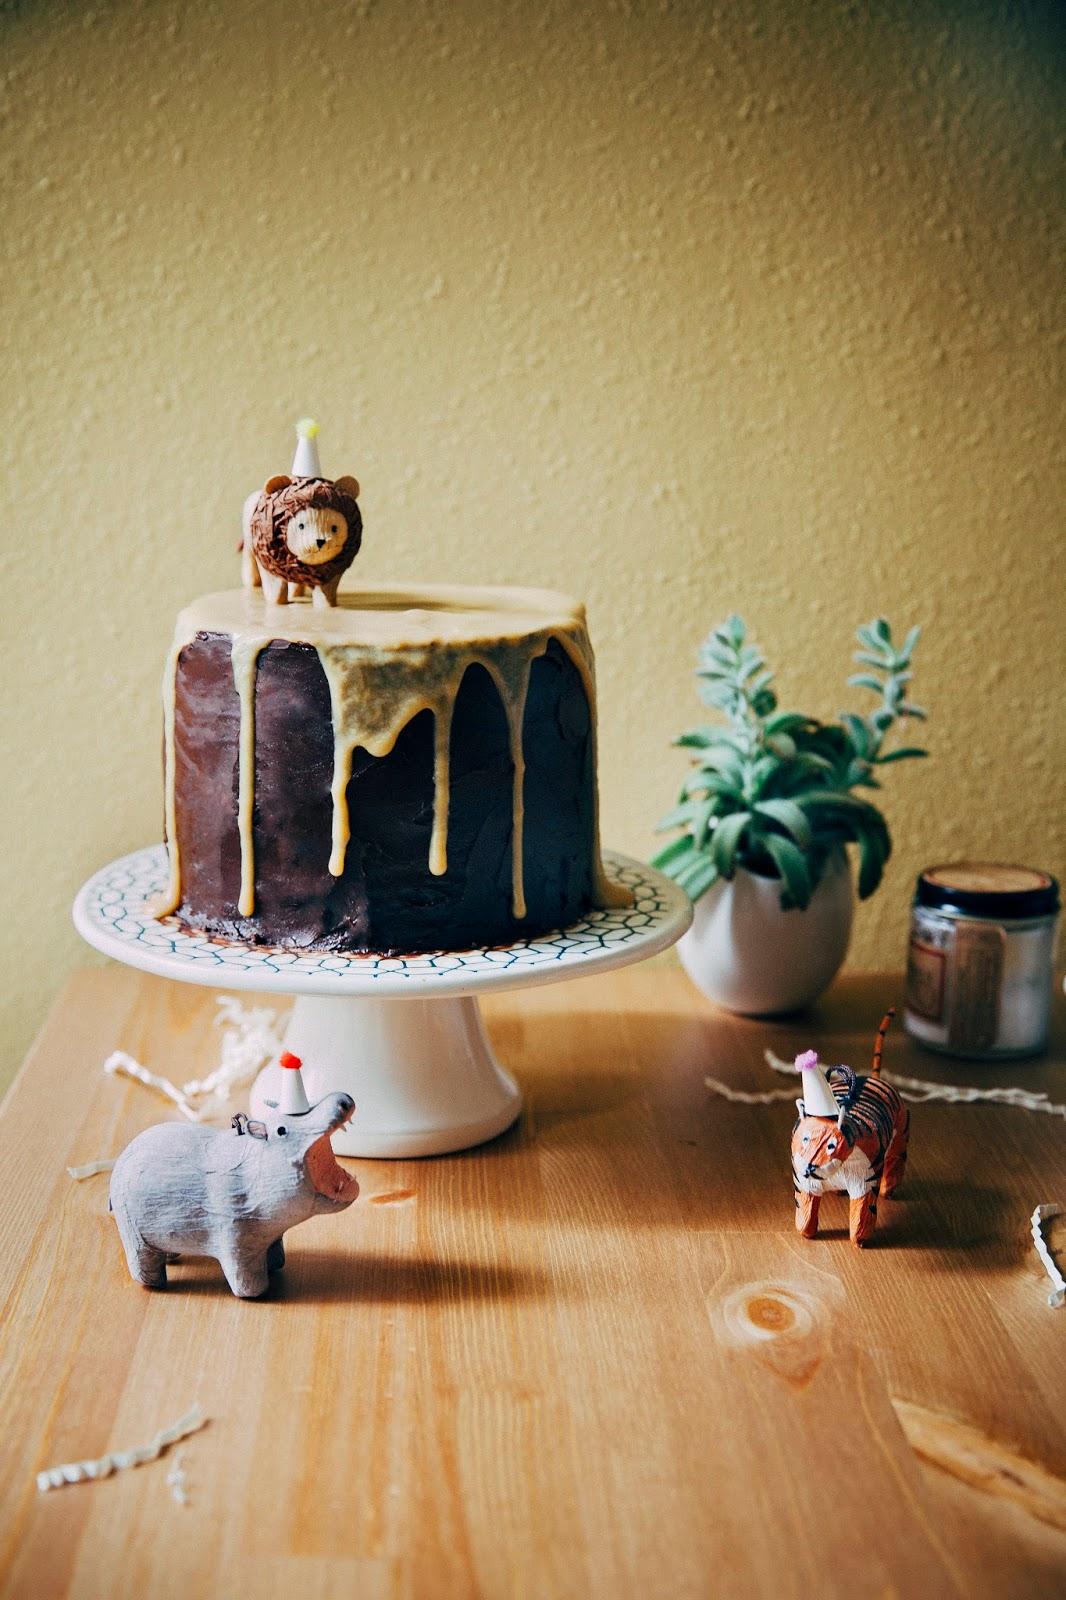 Boozy Yellow Birthday Cake with Chocolate Frosting and Caramelized White Chocolate Ganache